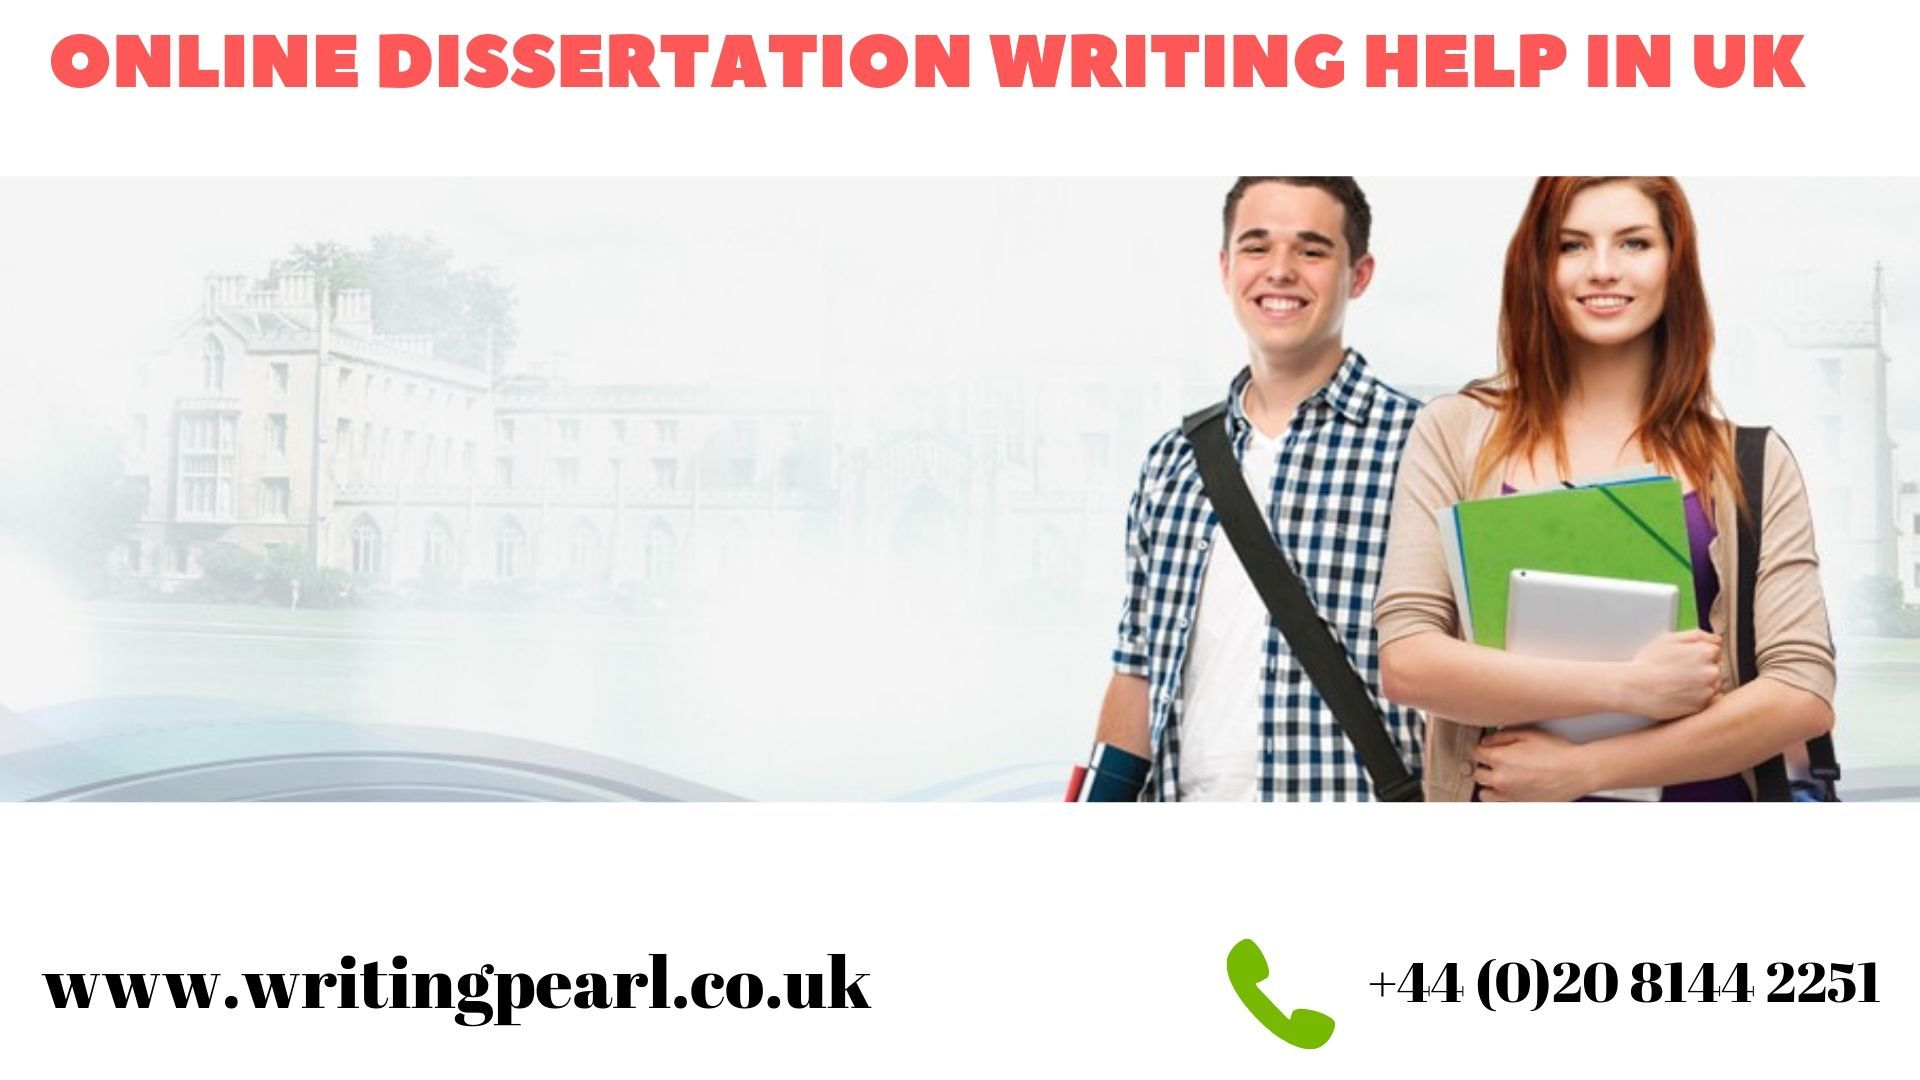 Dissertation Help Online Writing Service Academic Services Uk